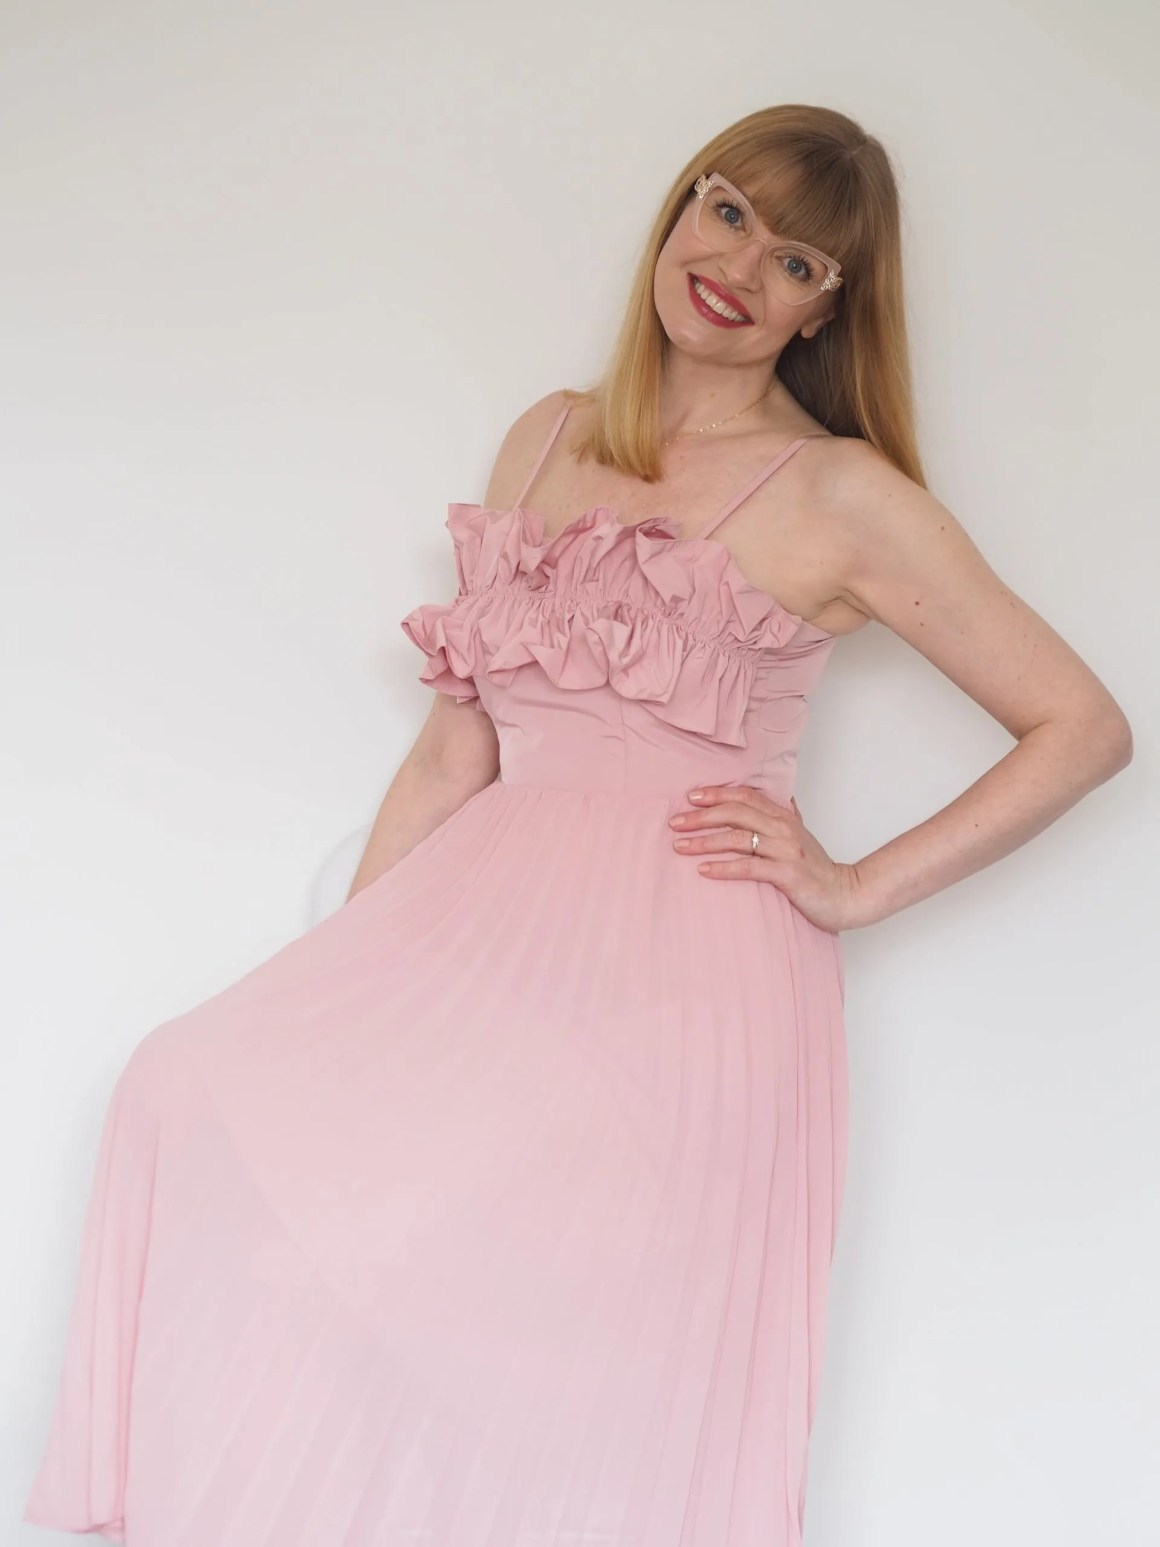 Elizabeth wears blush pink ruffle bodice dress and Pier Martino eyewear